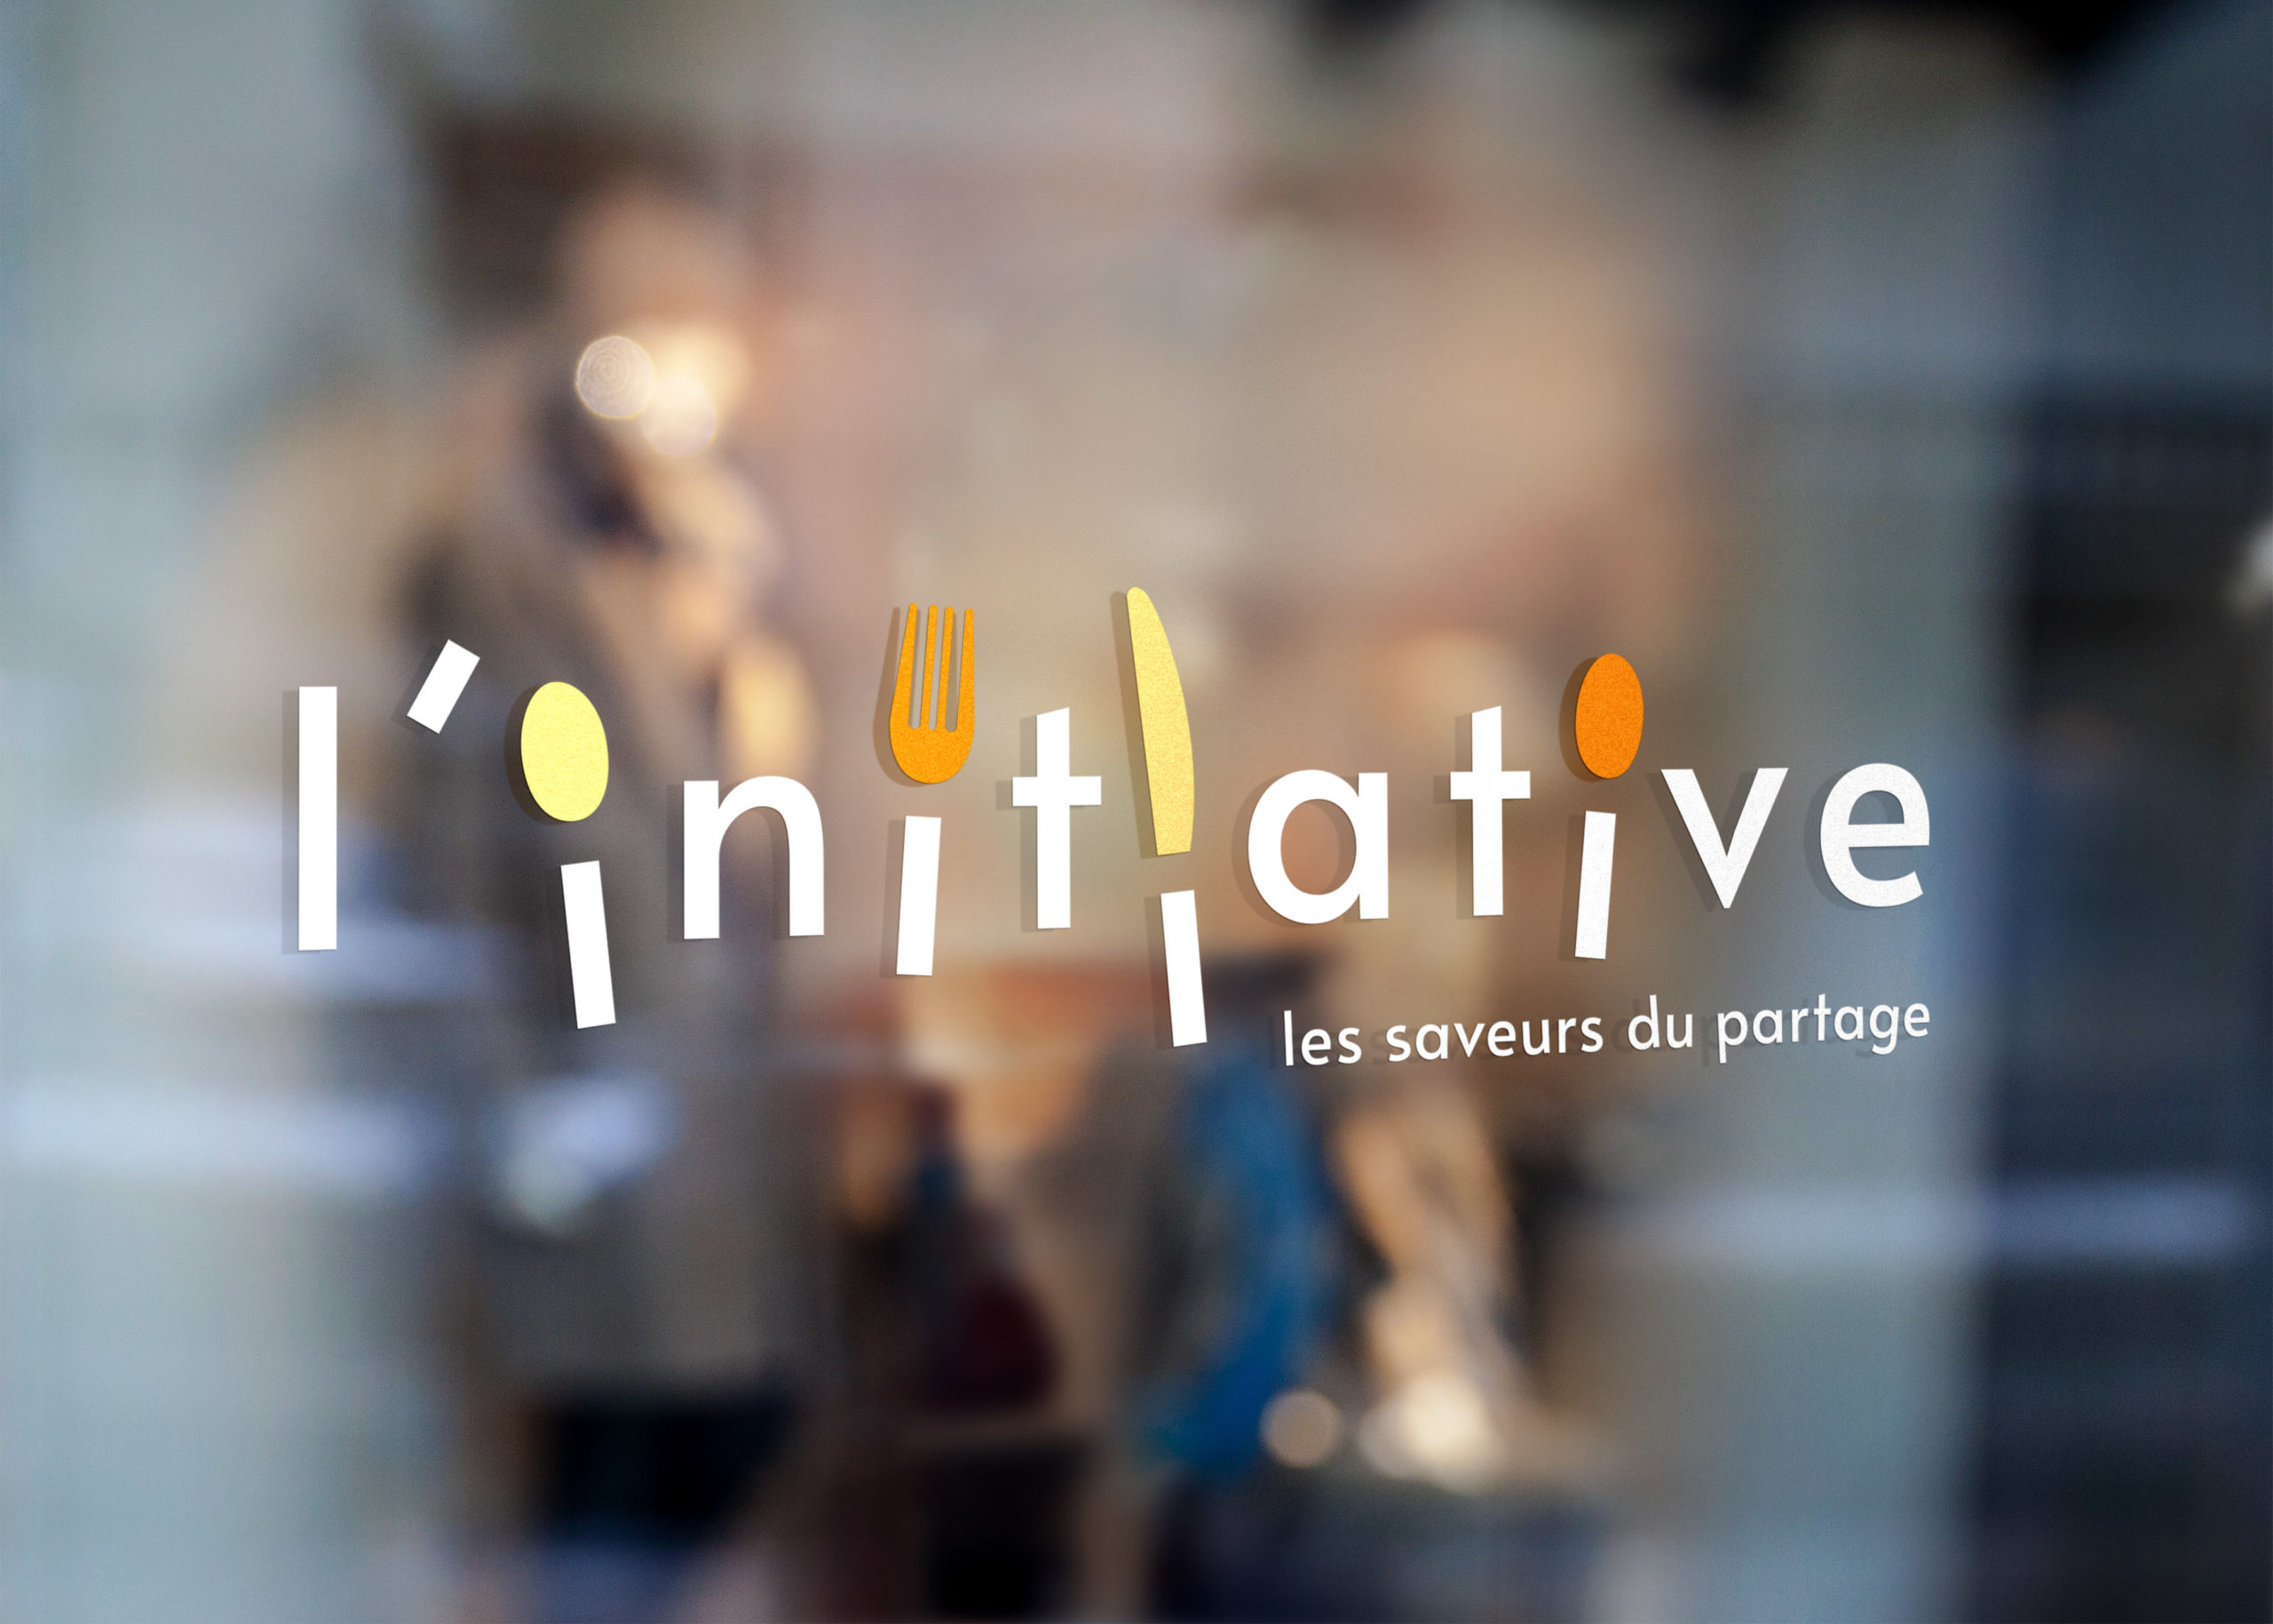 Logotype du restaurant L'Initiative sur la vitrine